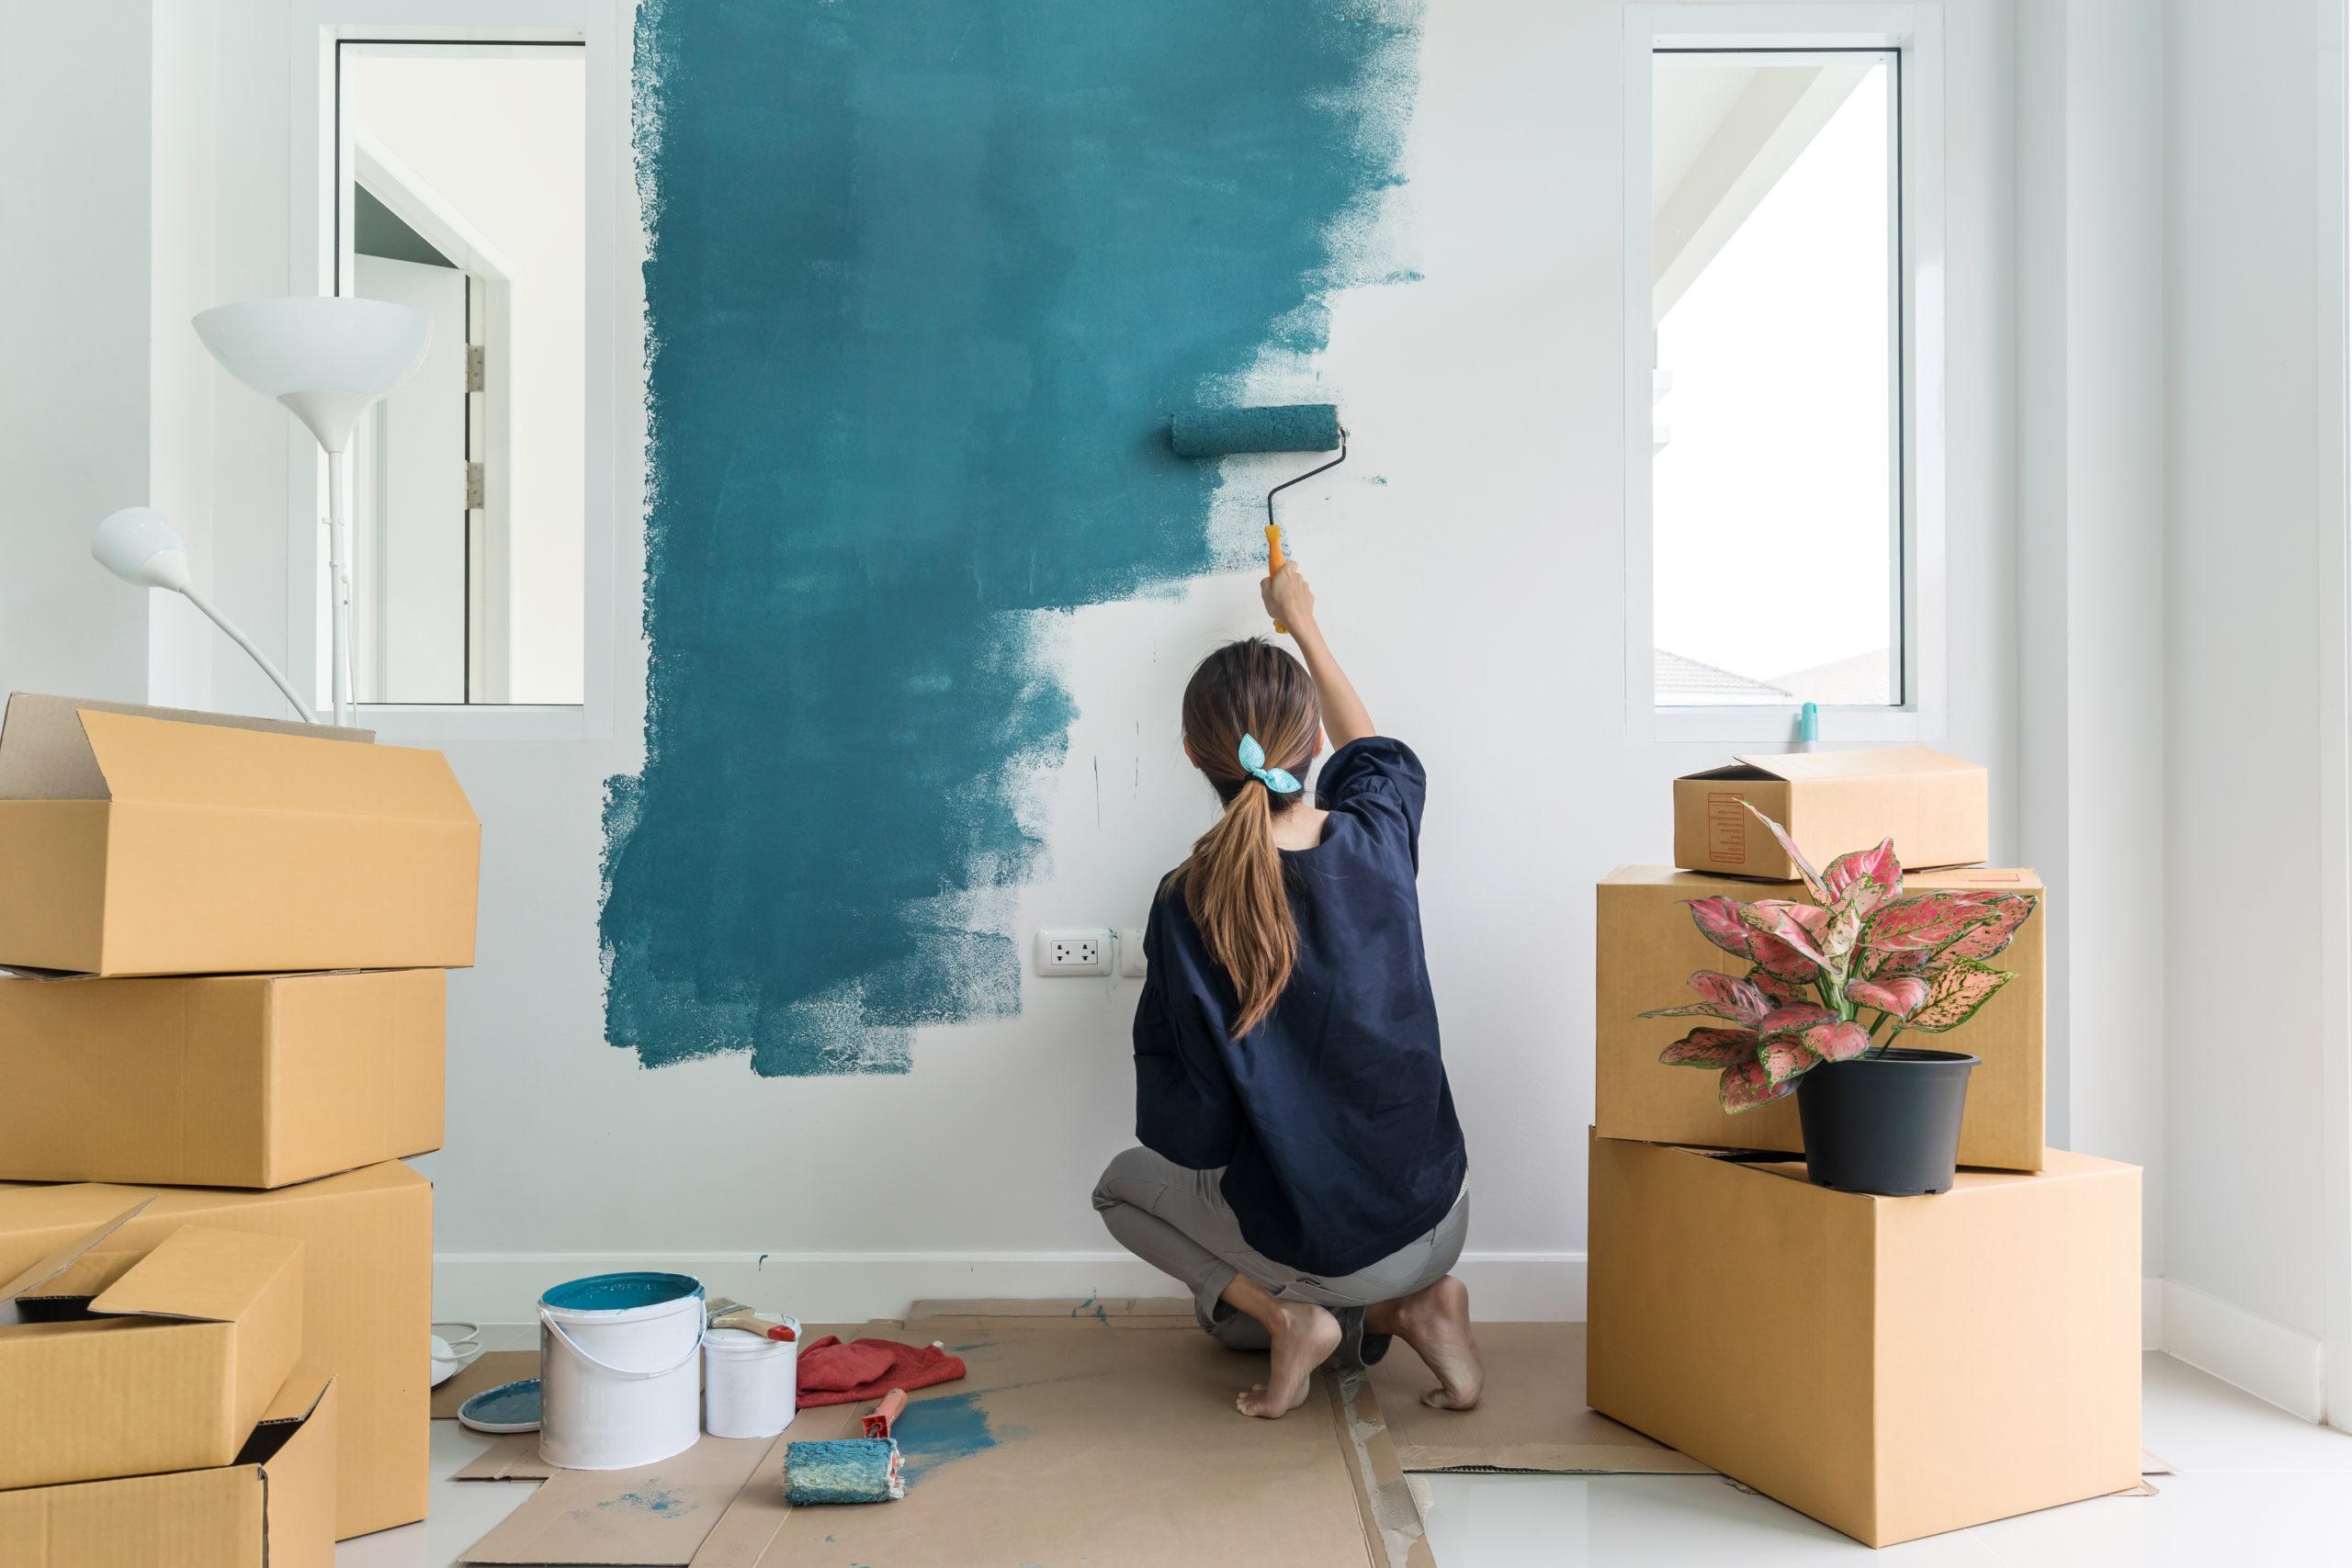 Home DIY kneeling painting interior wall